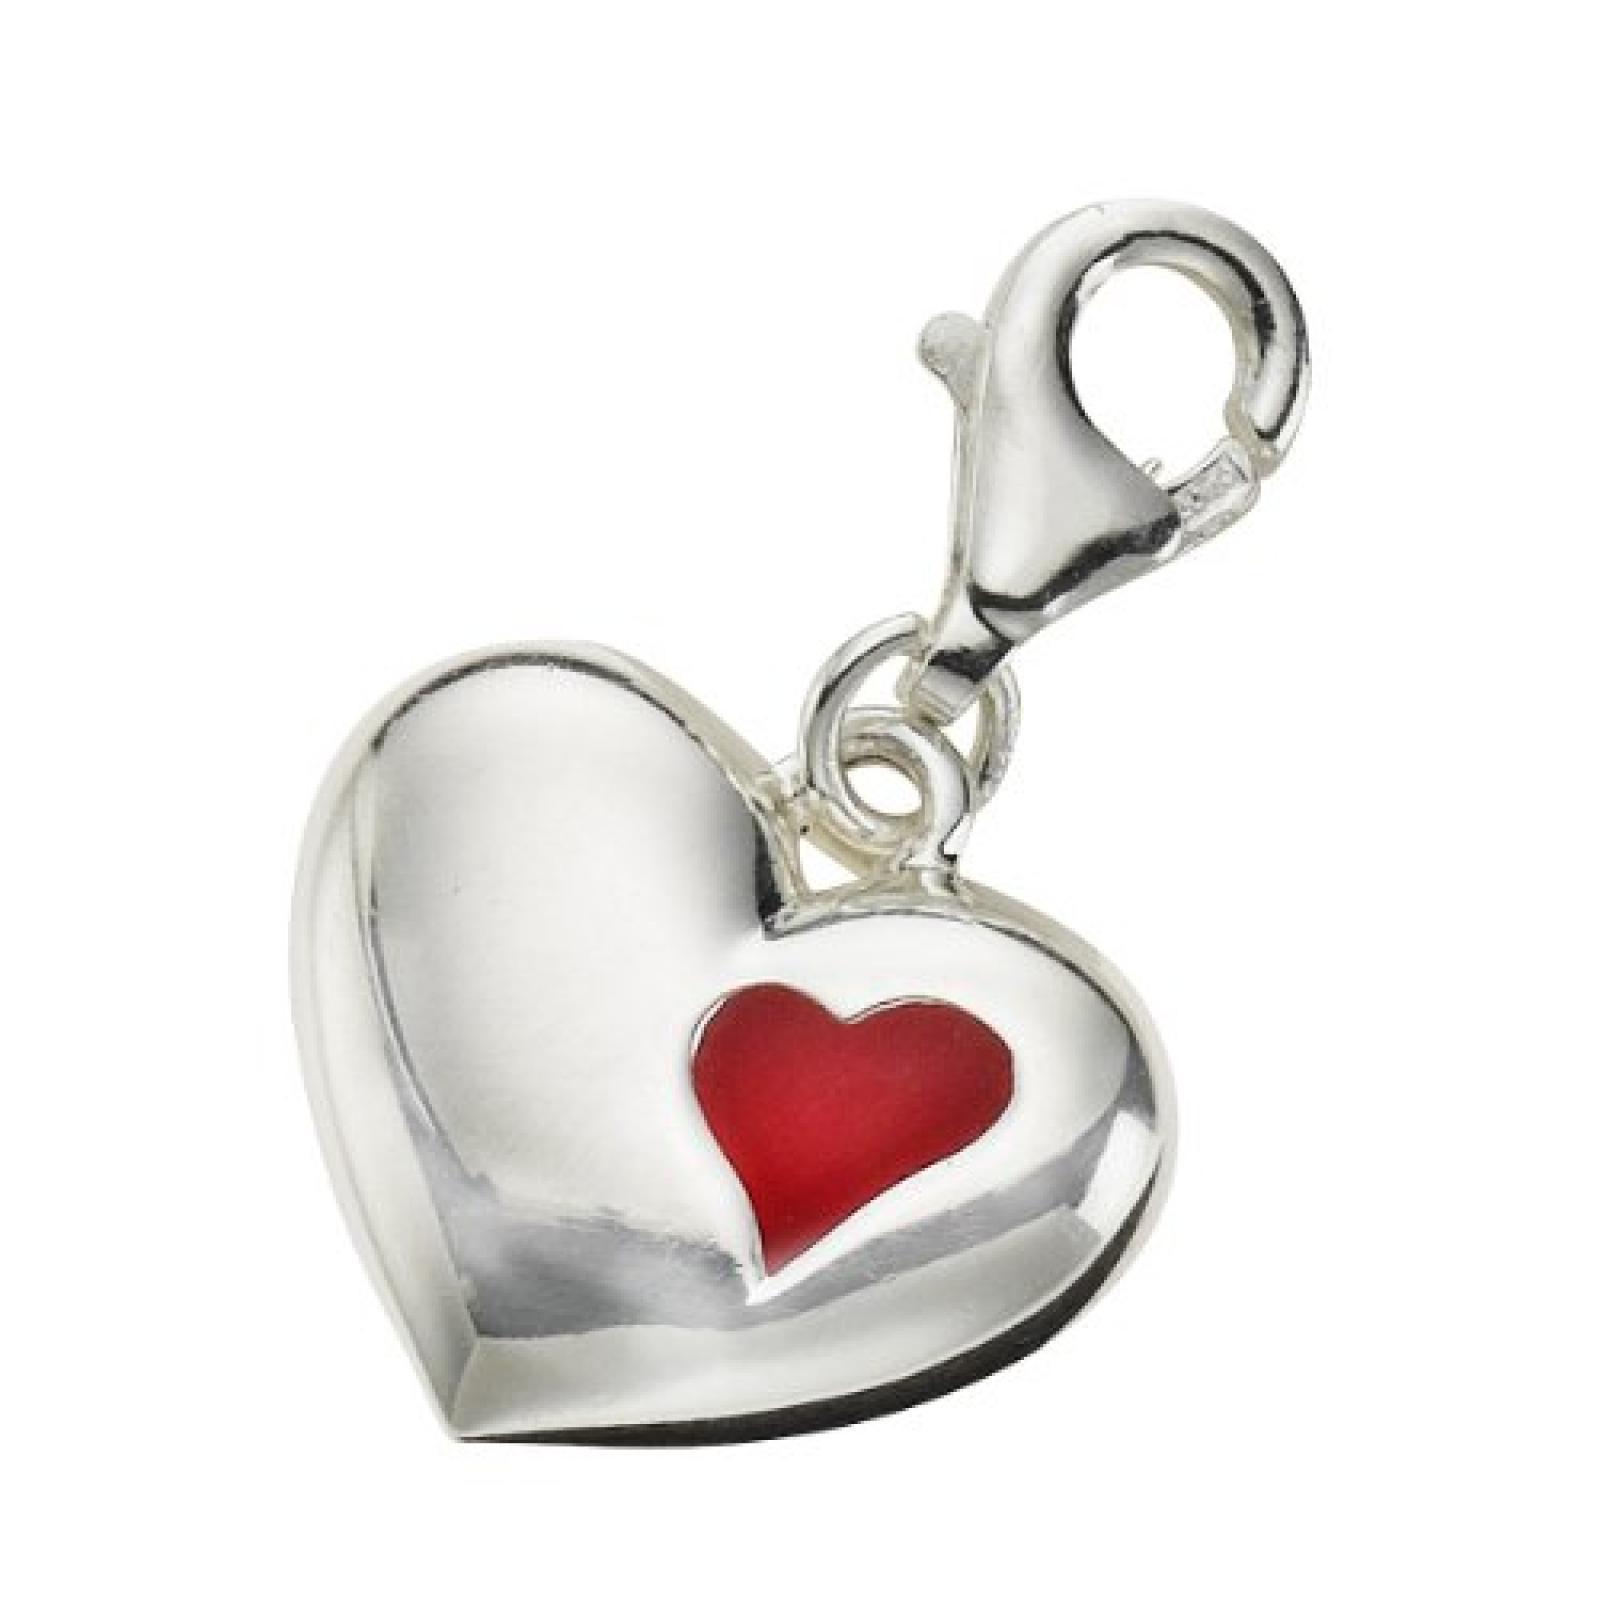 Zeeme Damen-Anhänger 925/- Sterling Silber Mit Rotem Lack Herz 280240041